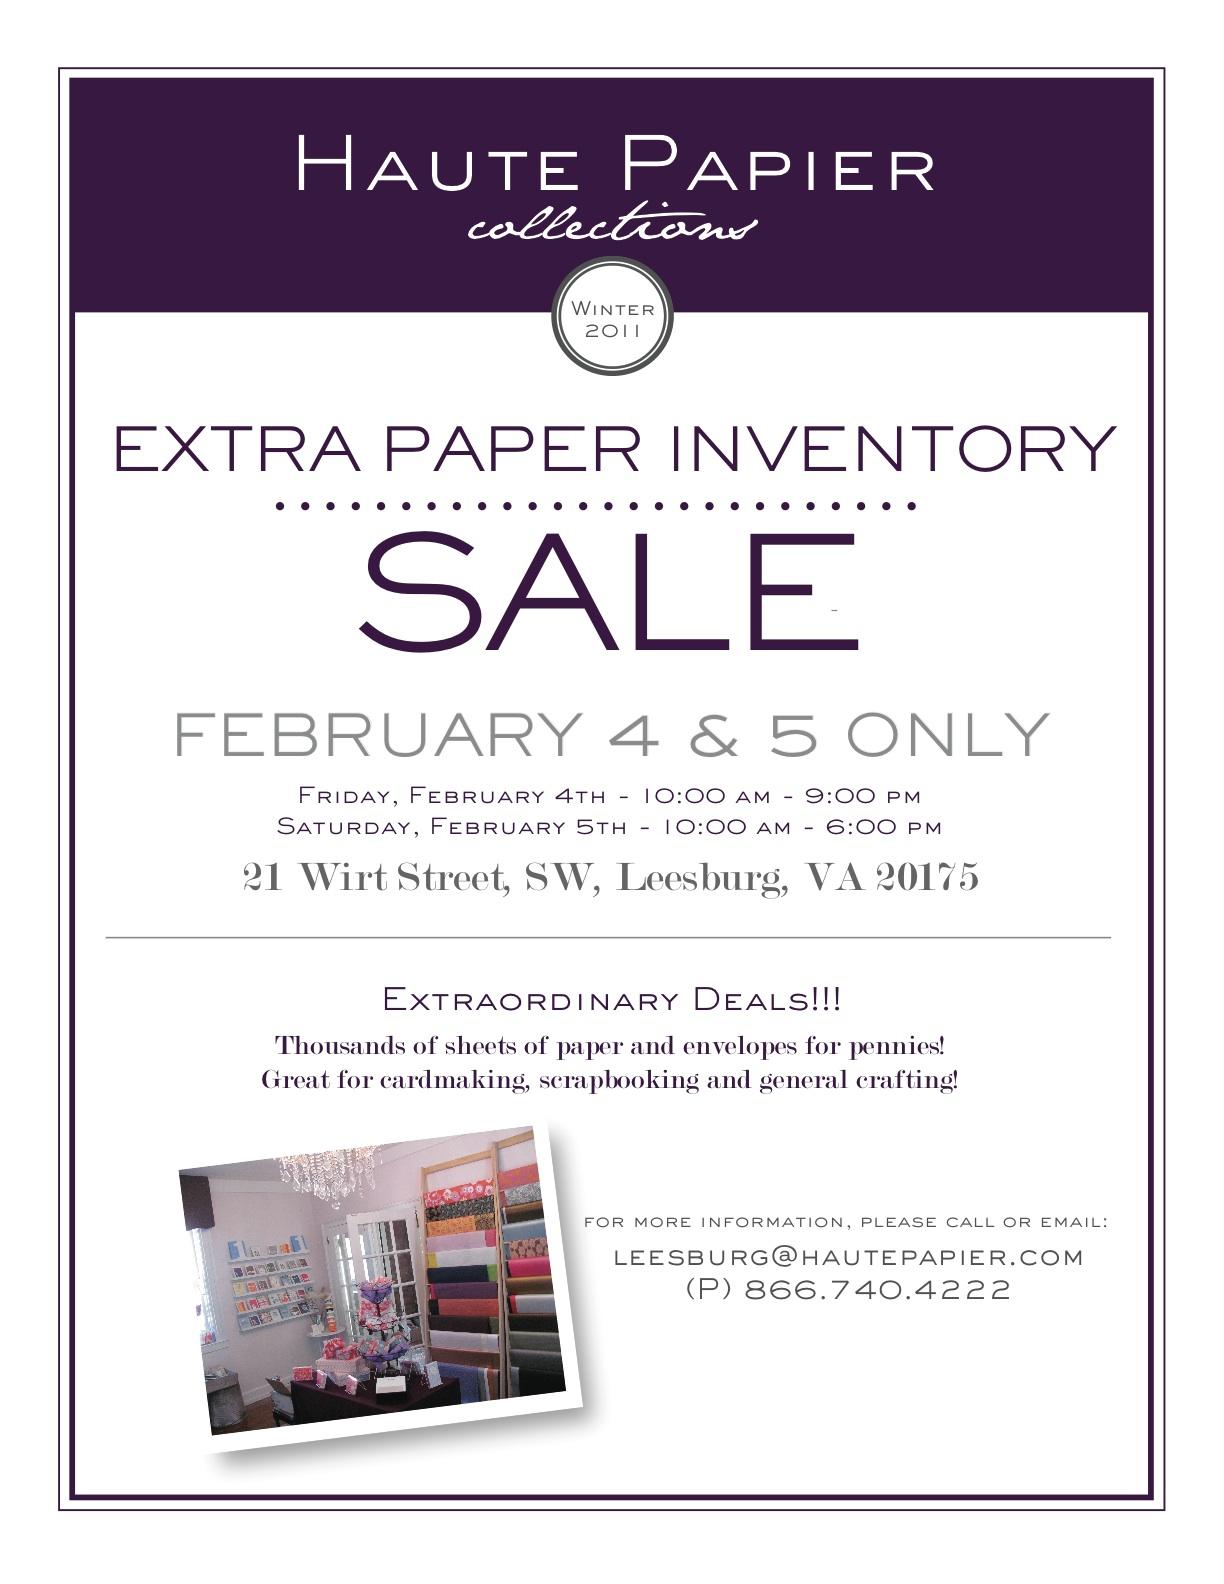 Haute Papier Extra Inventory Sale